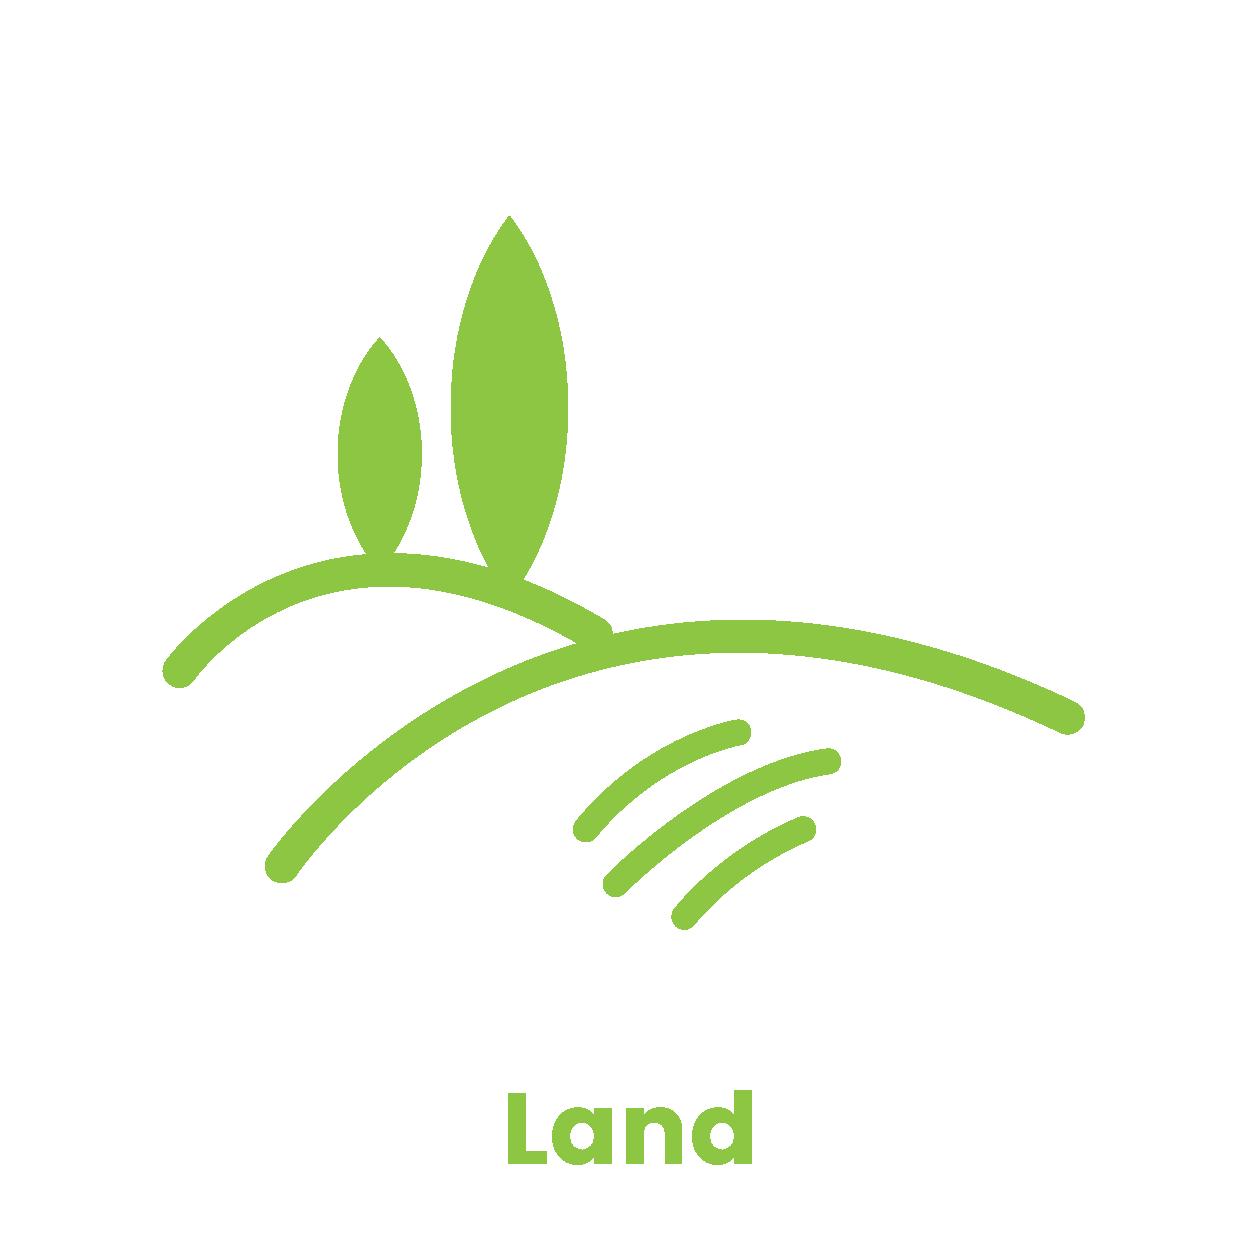 p4 PM - Land-01.png